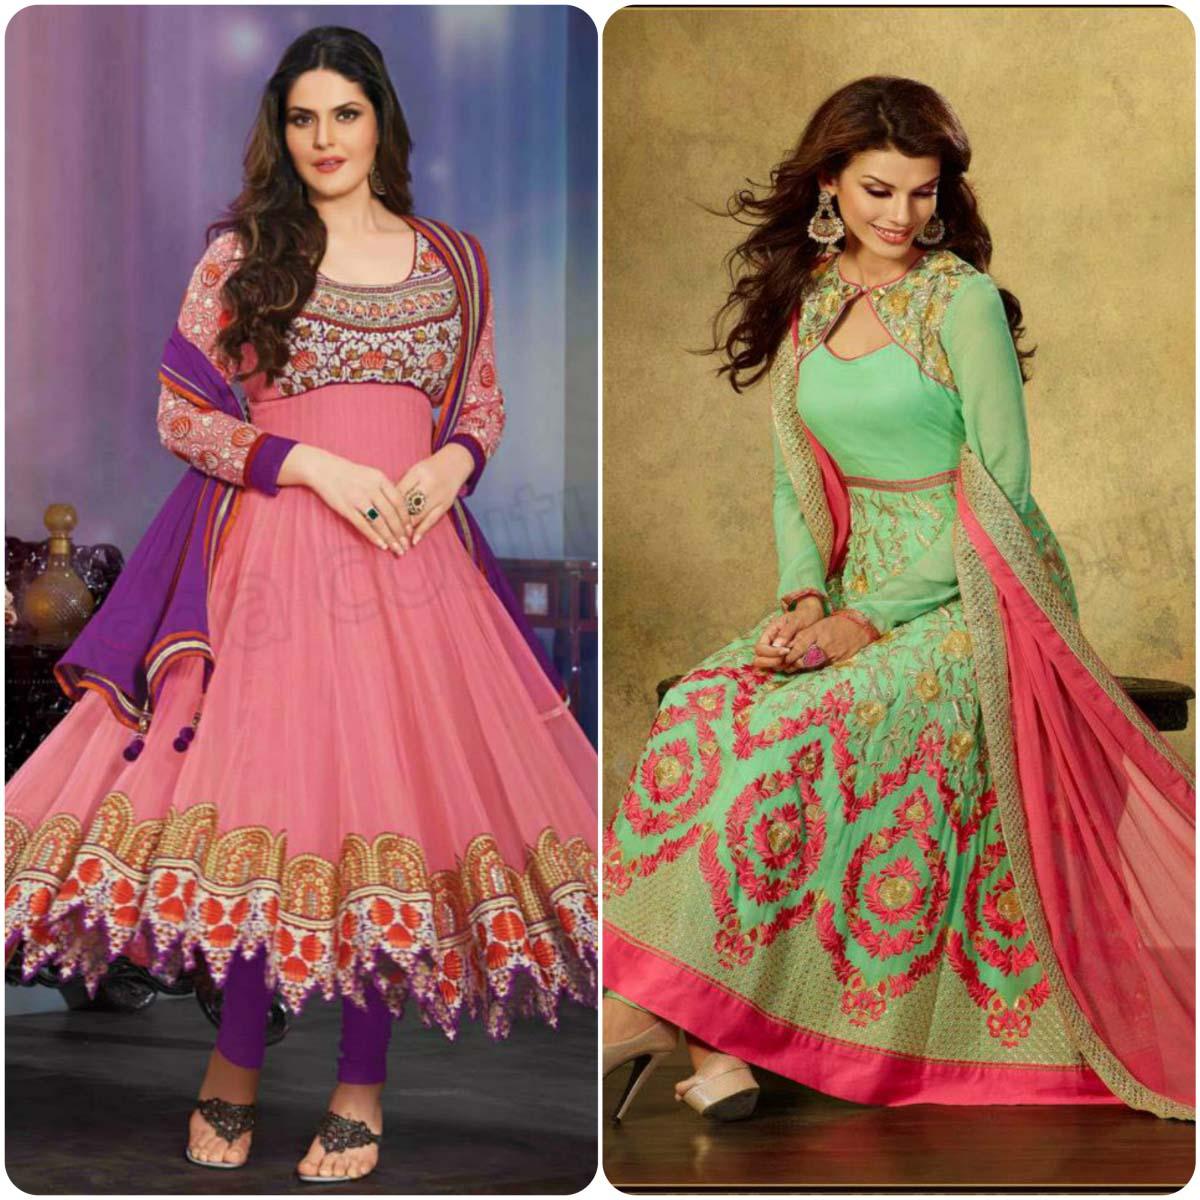 Natasha Couture Latest Indian Anarkali Dress Desigs Collection 2016-2017...styloplanet (2)